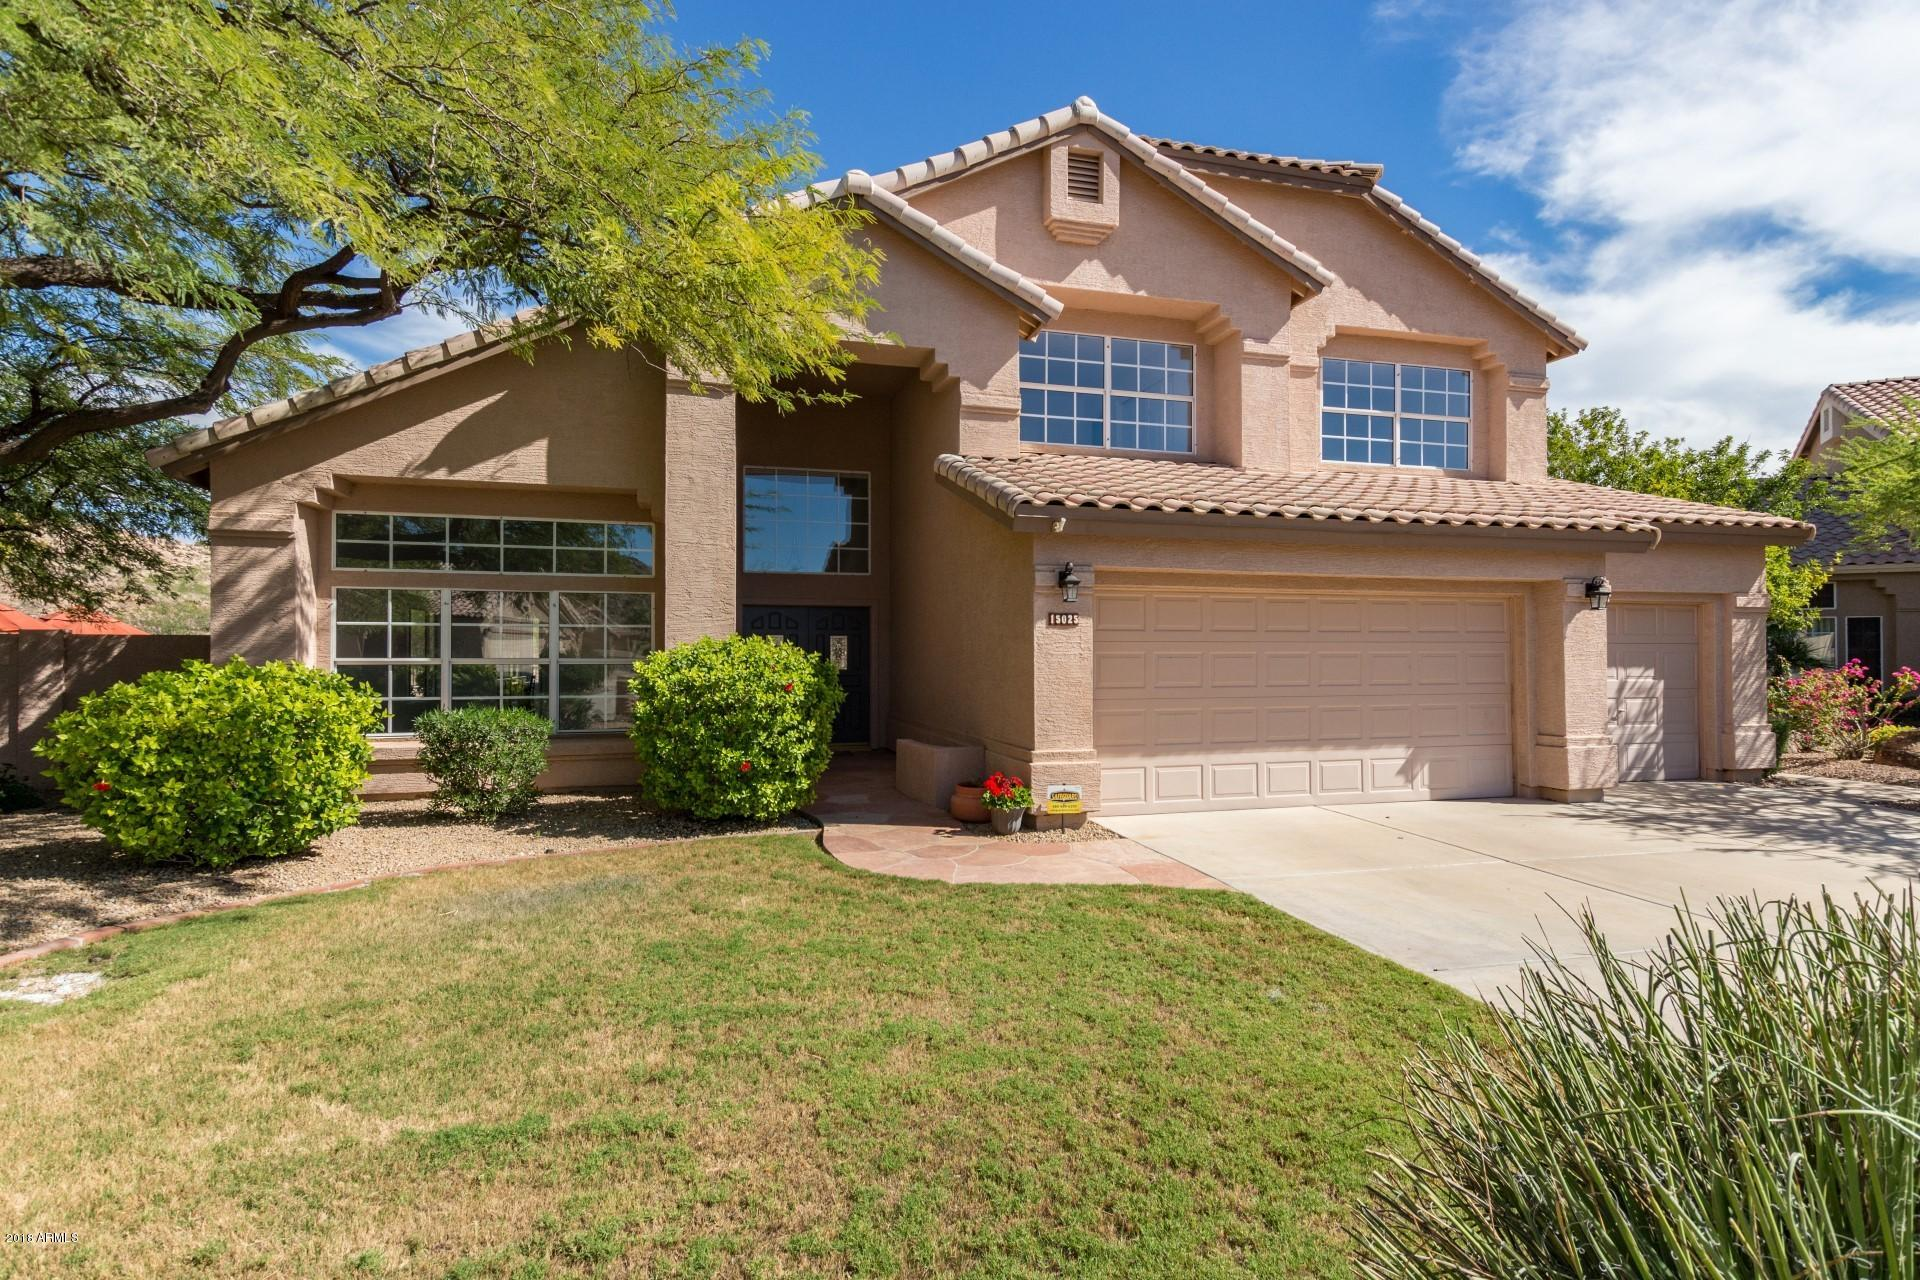 Photo of 15025 S FOXTAIL Lane, Phoenix, AZ 85048